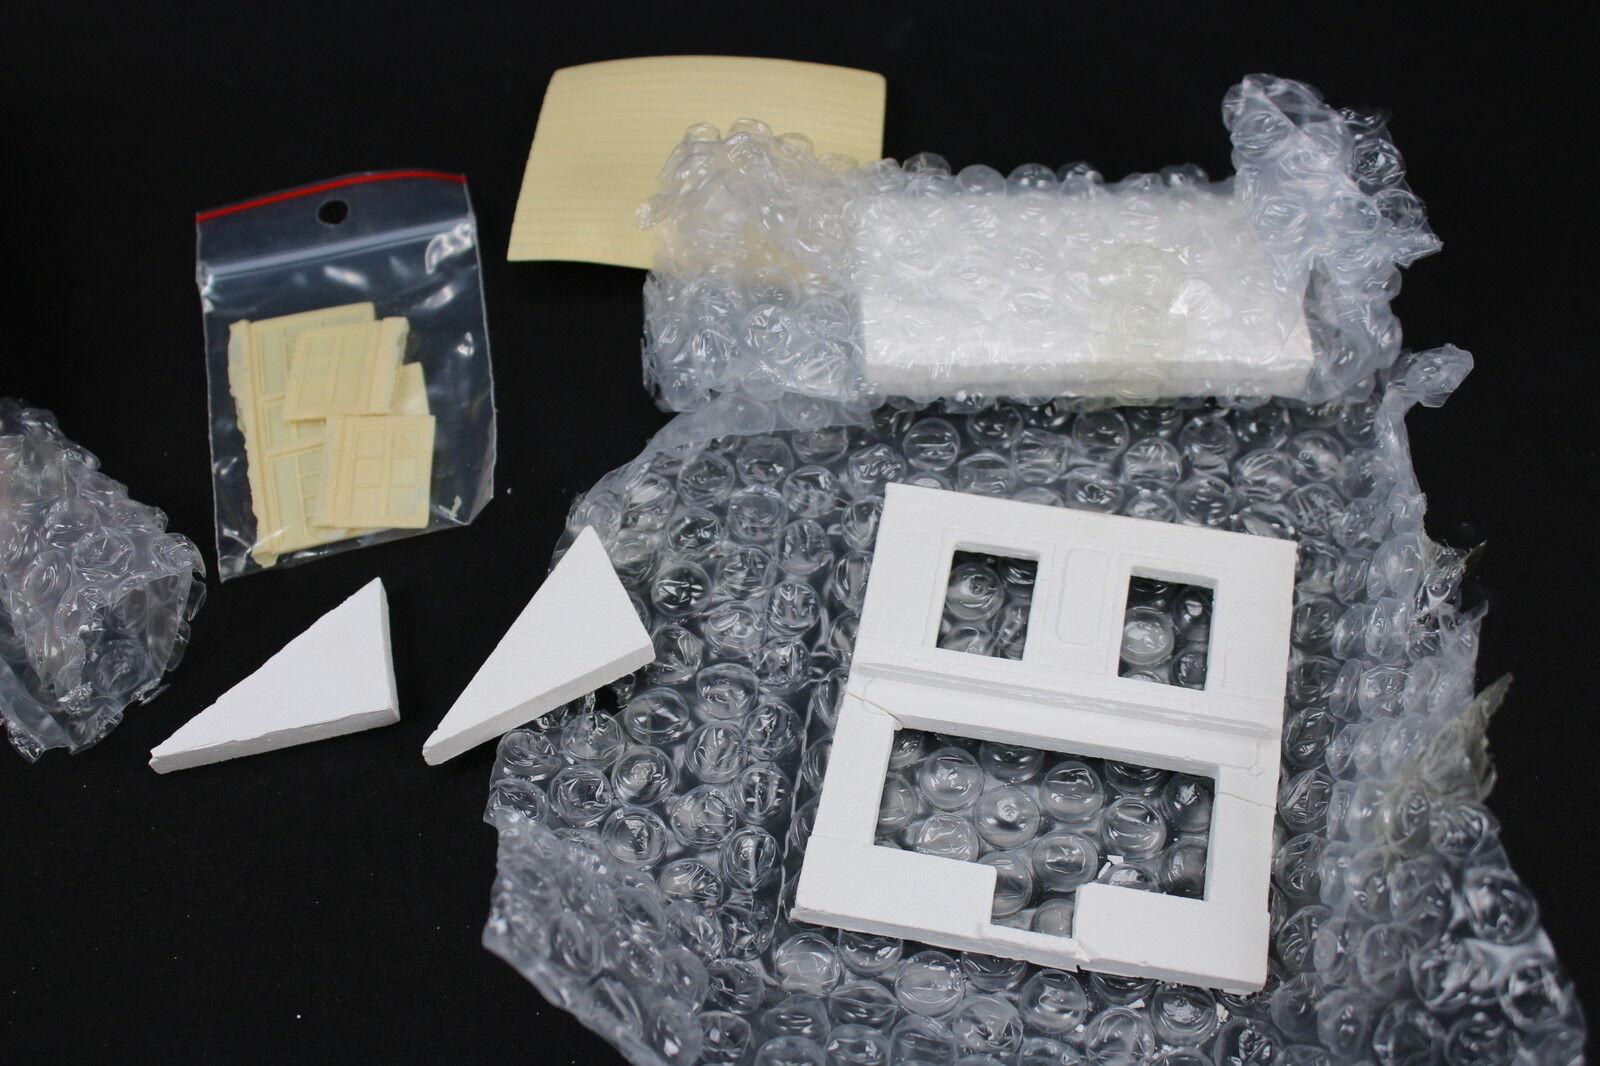 YY034 JMP Productions Rare Construction Plaster Plaster Plaster 72040 Facia House Diorama Street 683